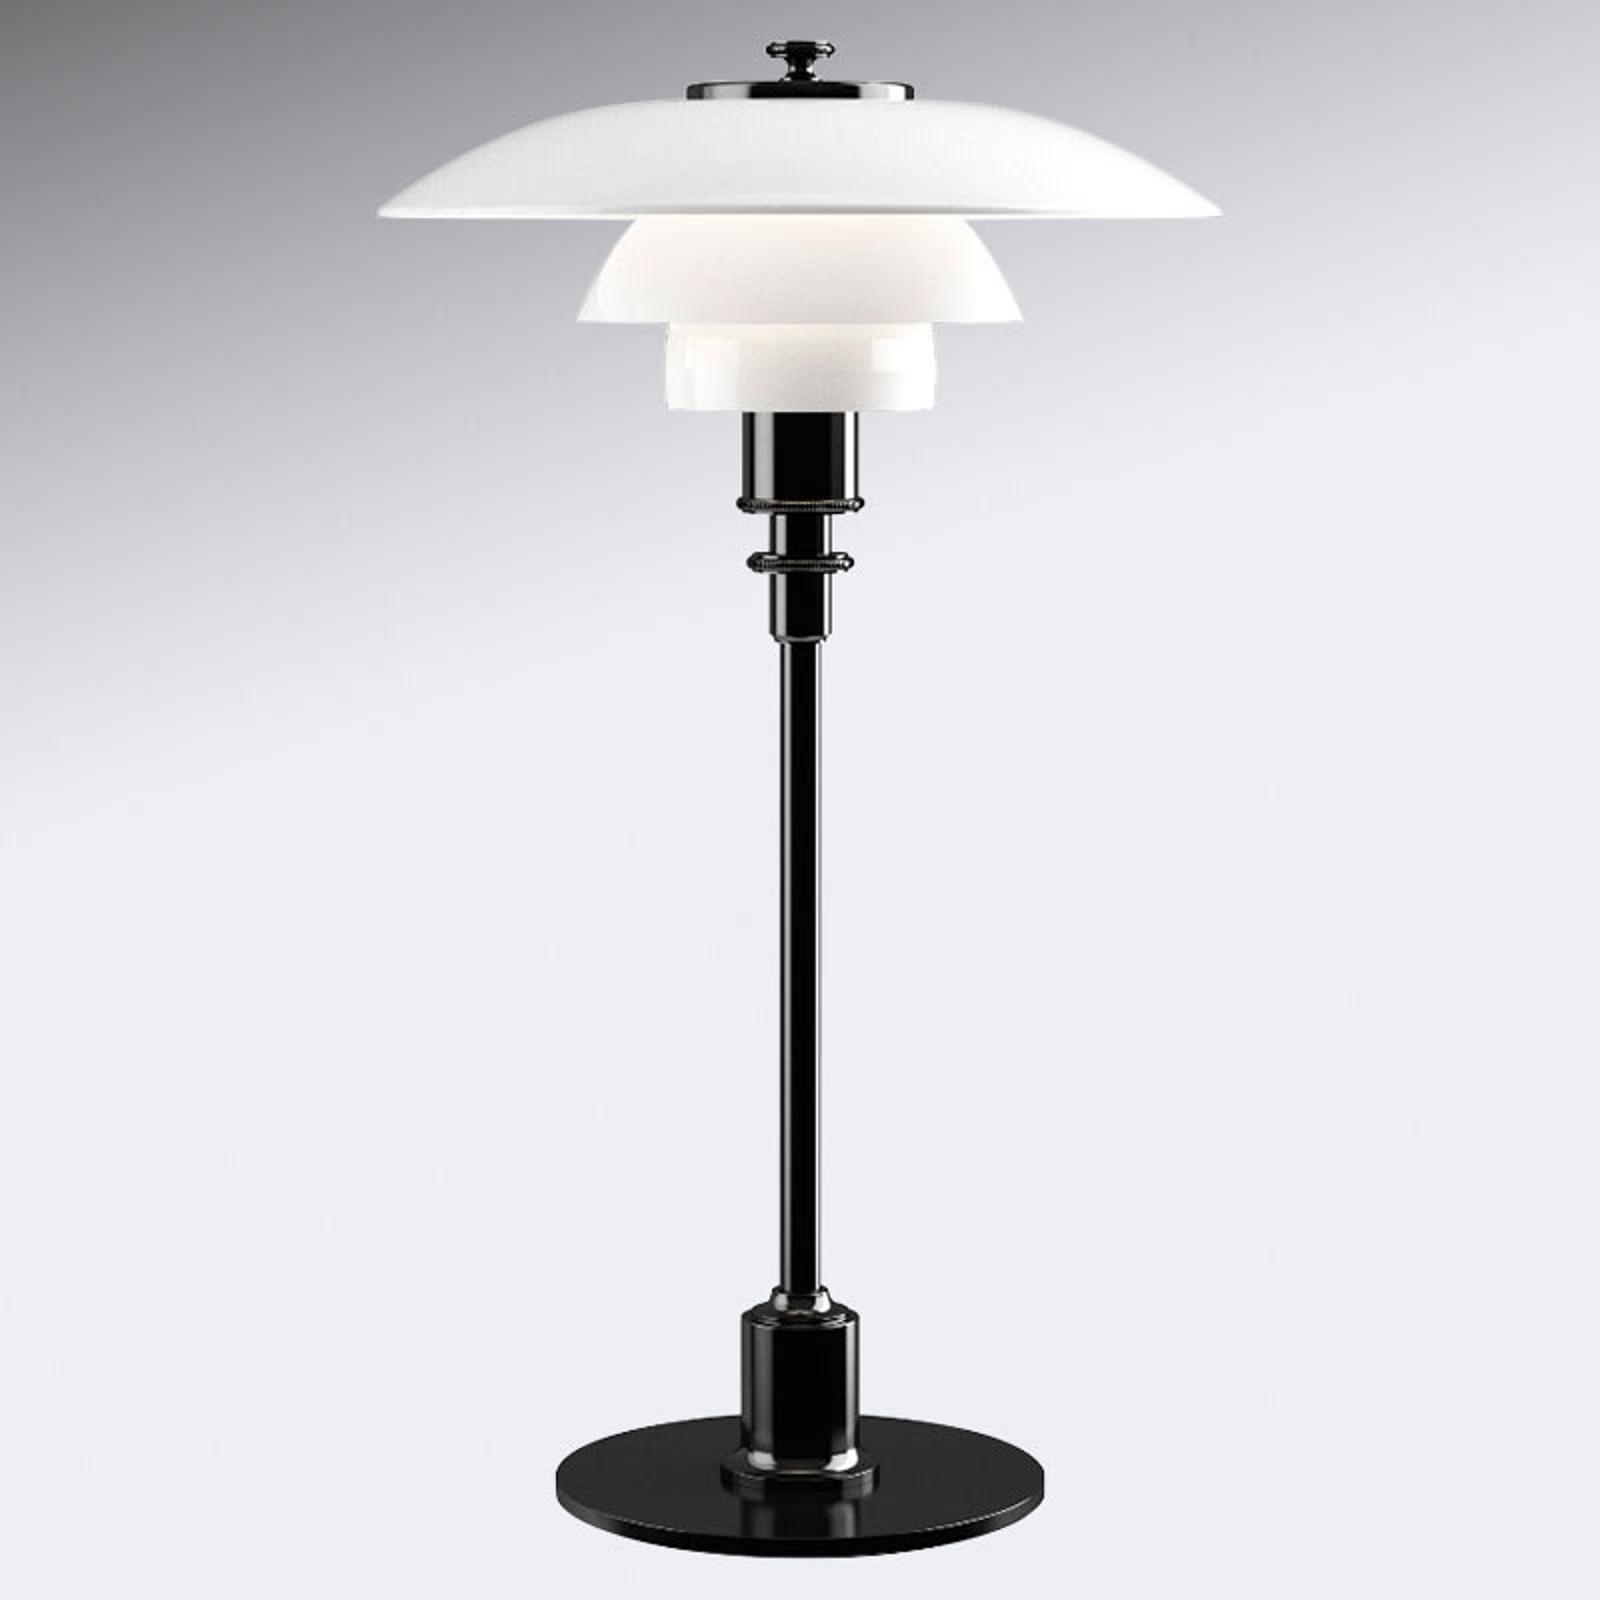 Tafellamp PH 2/1 - zwart gemetalliseerde voet